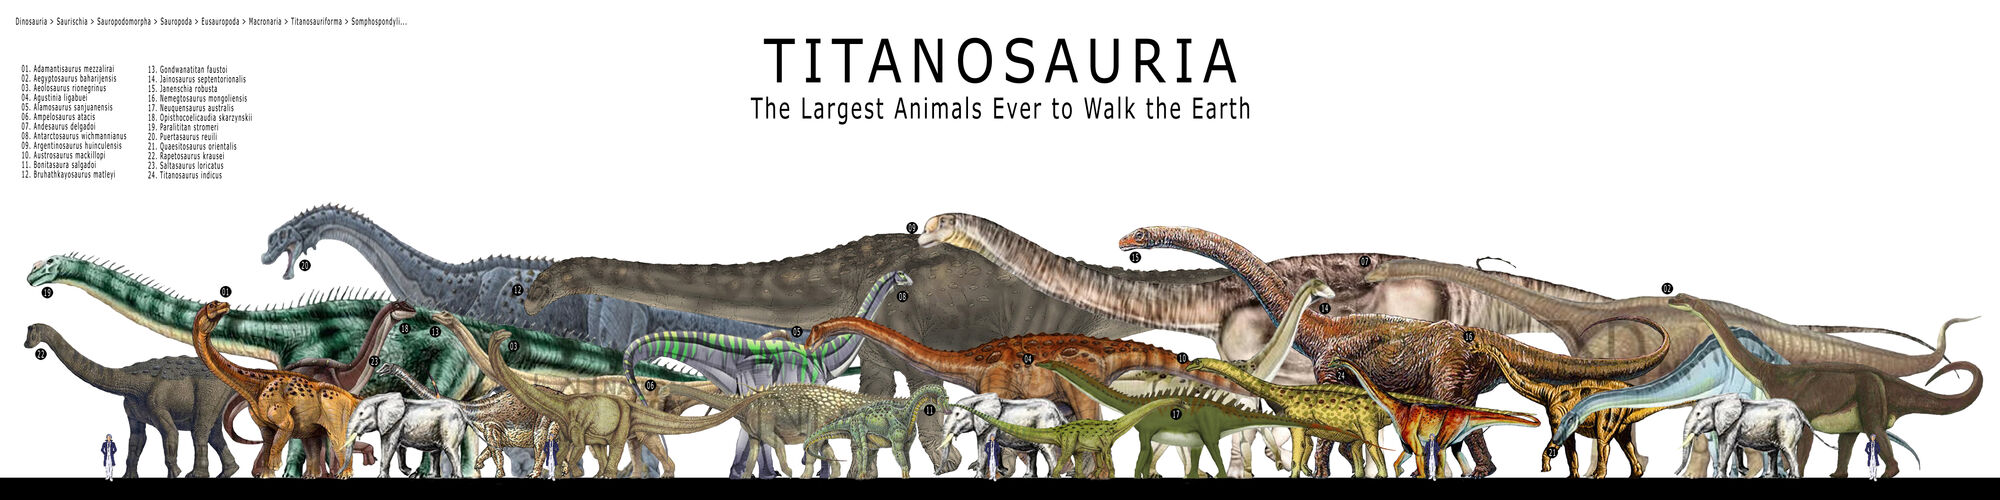 Titanosauria | Dinosau... Ampelosaurus Dinosaur King